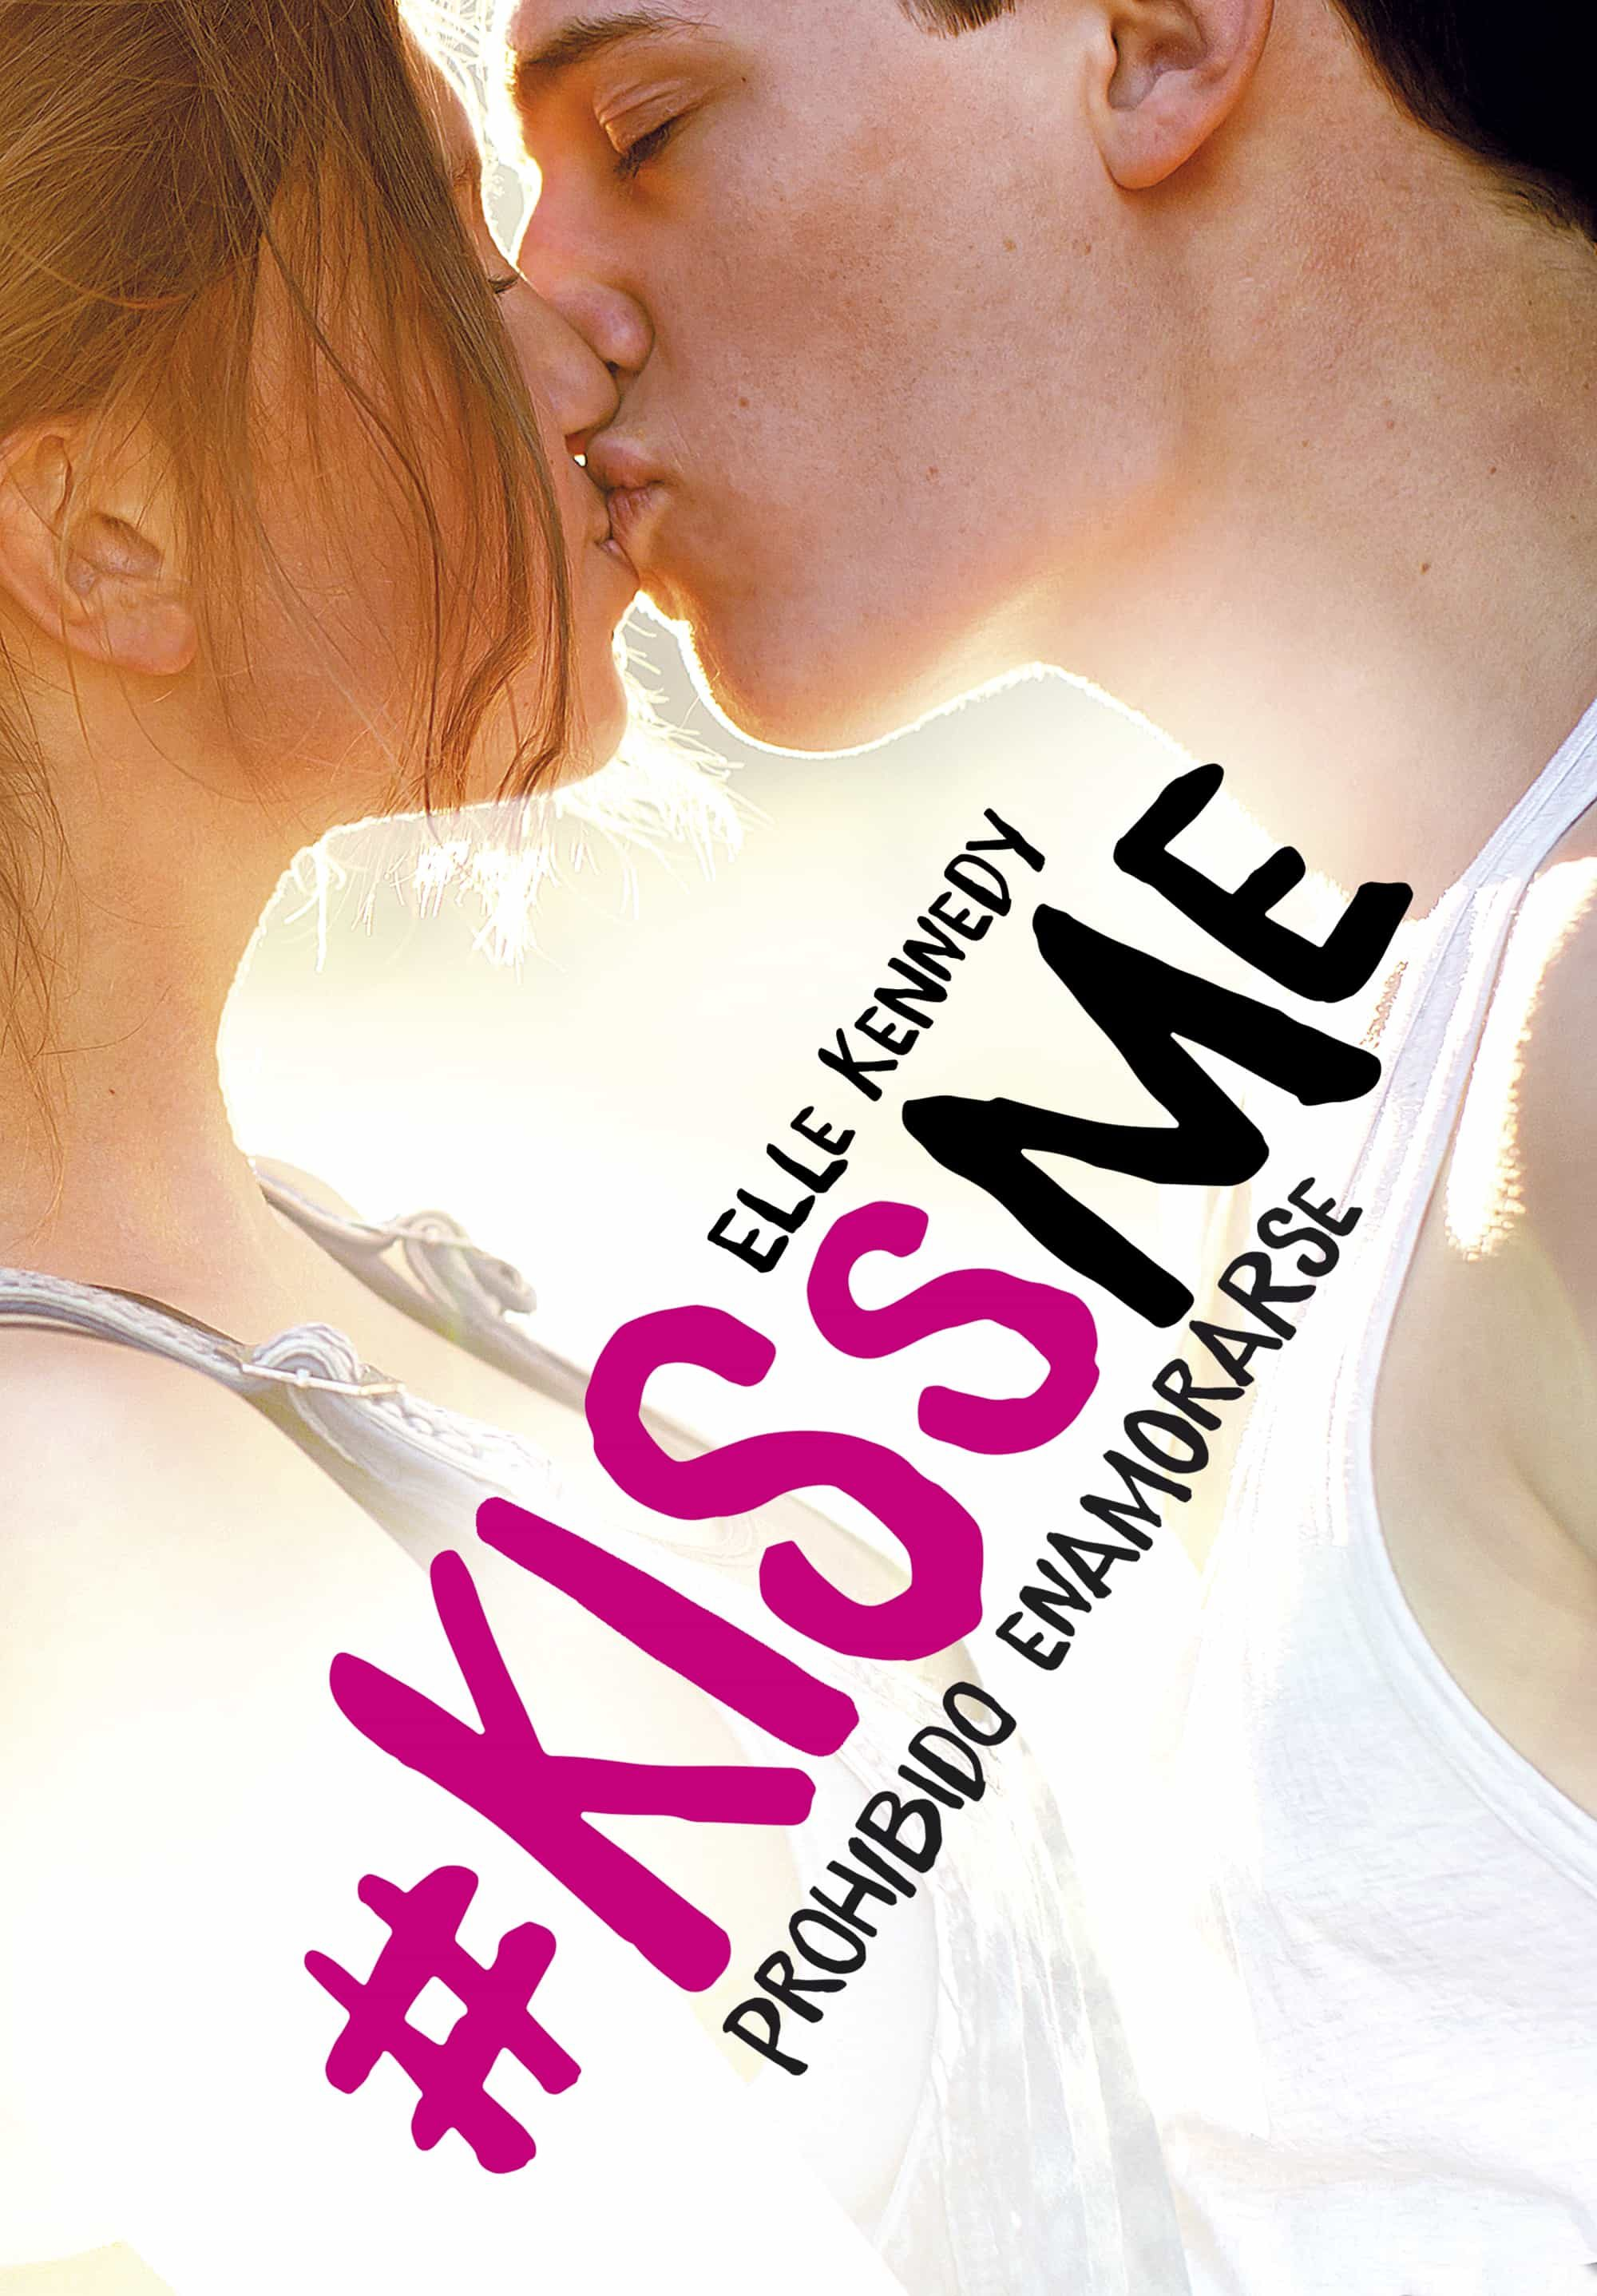 prohibido-enamorarse-kiss-me-elle-kennedy